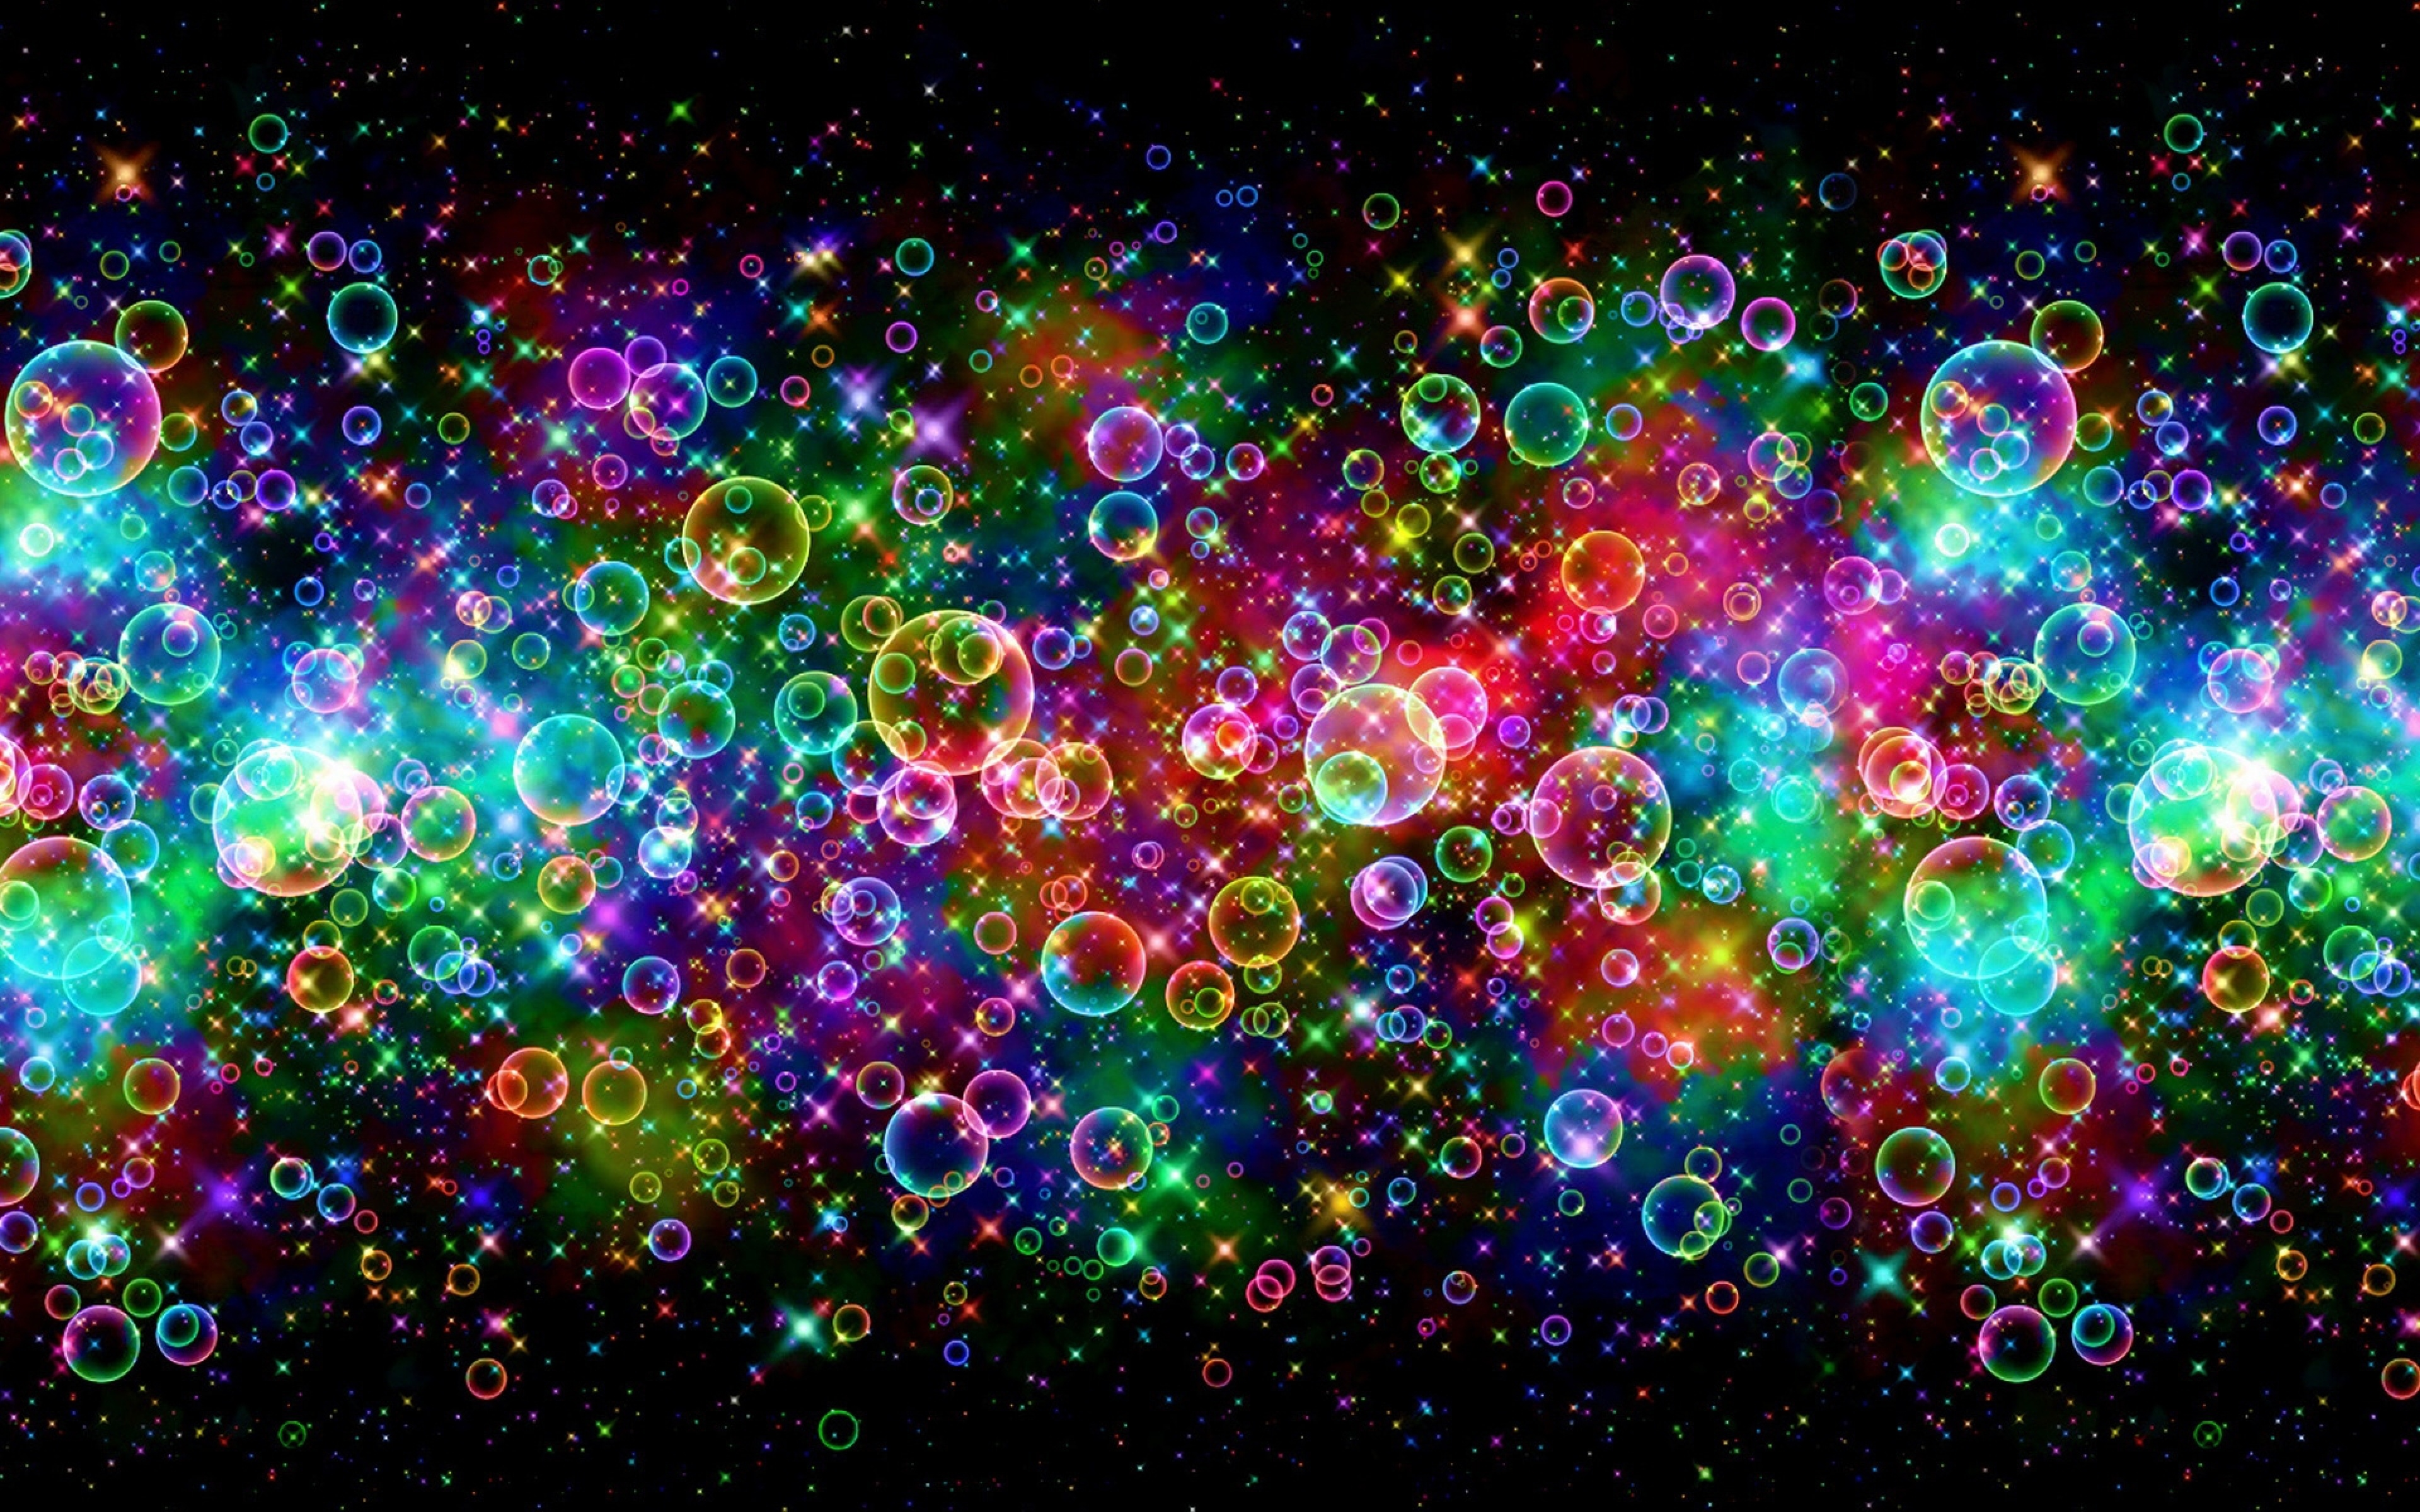 bubbles digital art desktop colorful background hd wallpaper 3840x2400